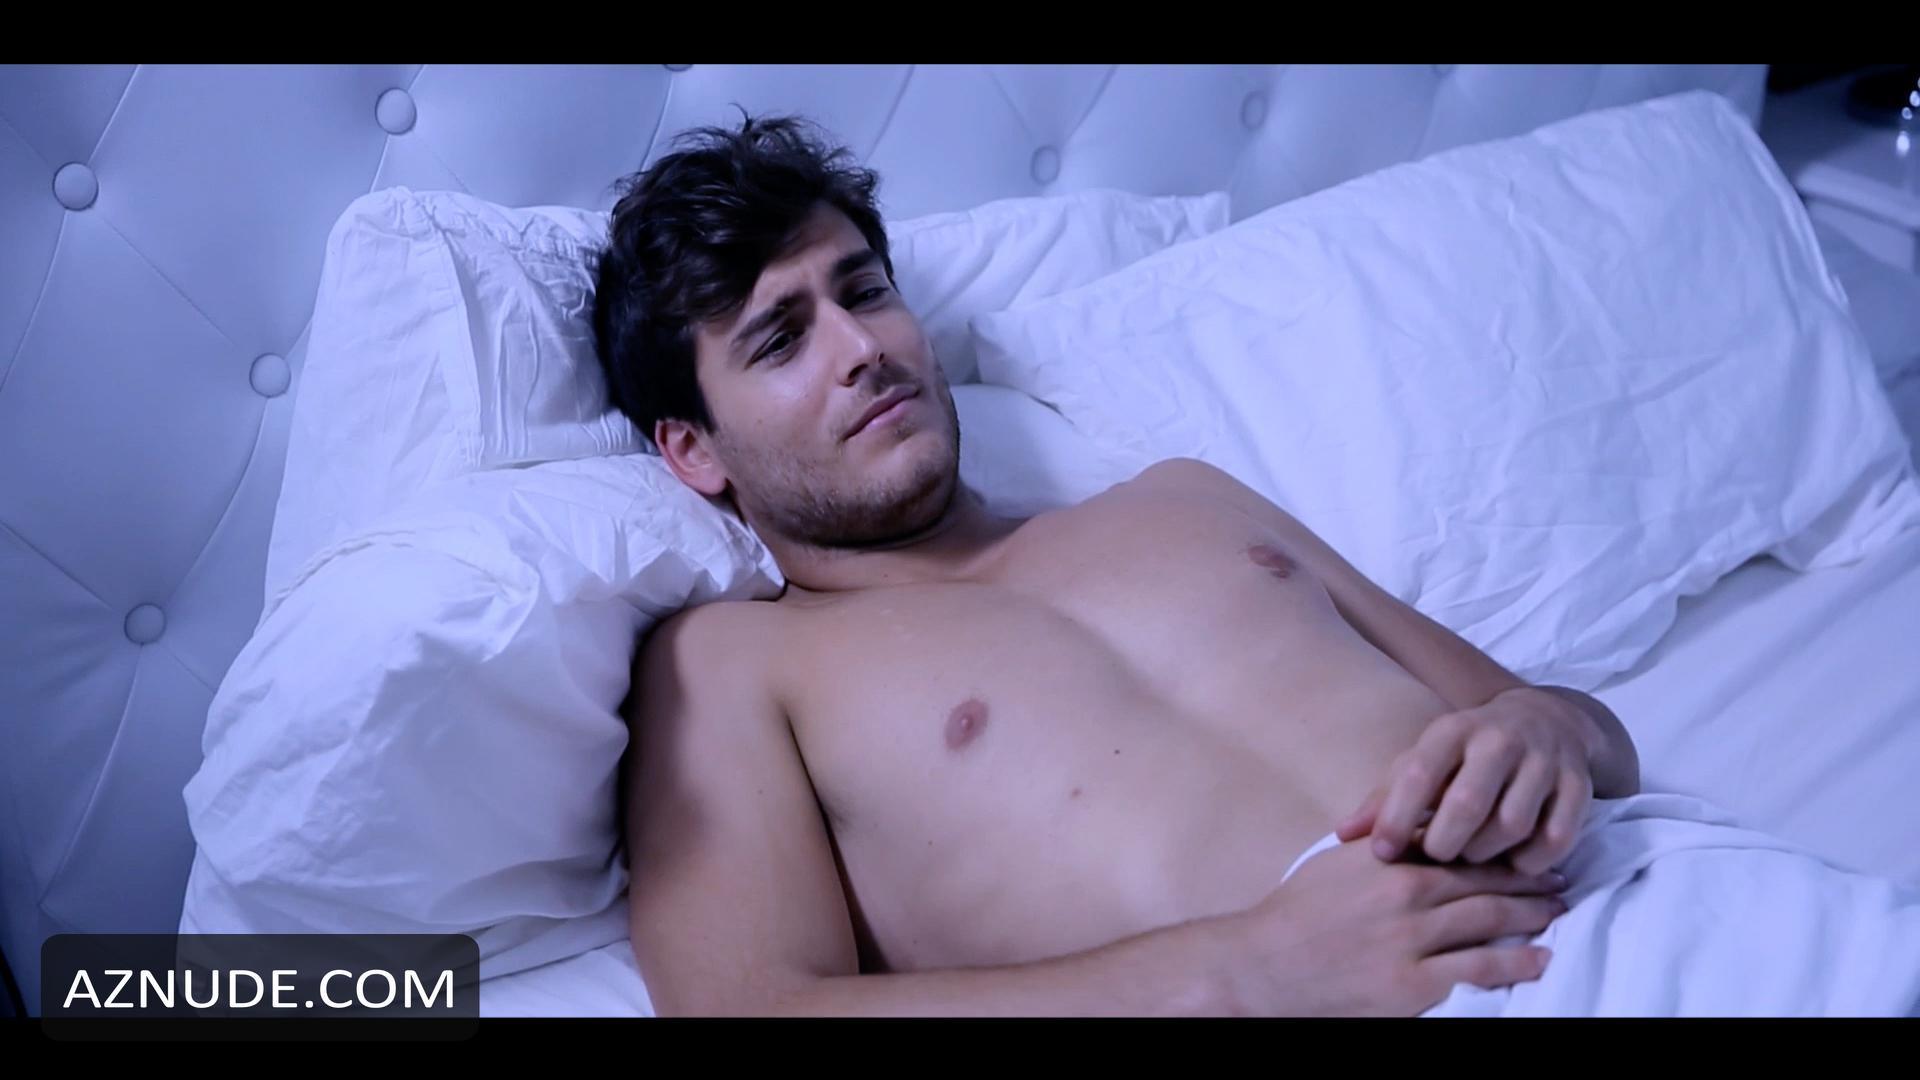 Wild Awakening Nude Scenes - Aznude Men-2590